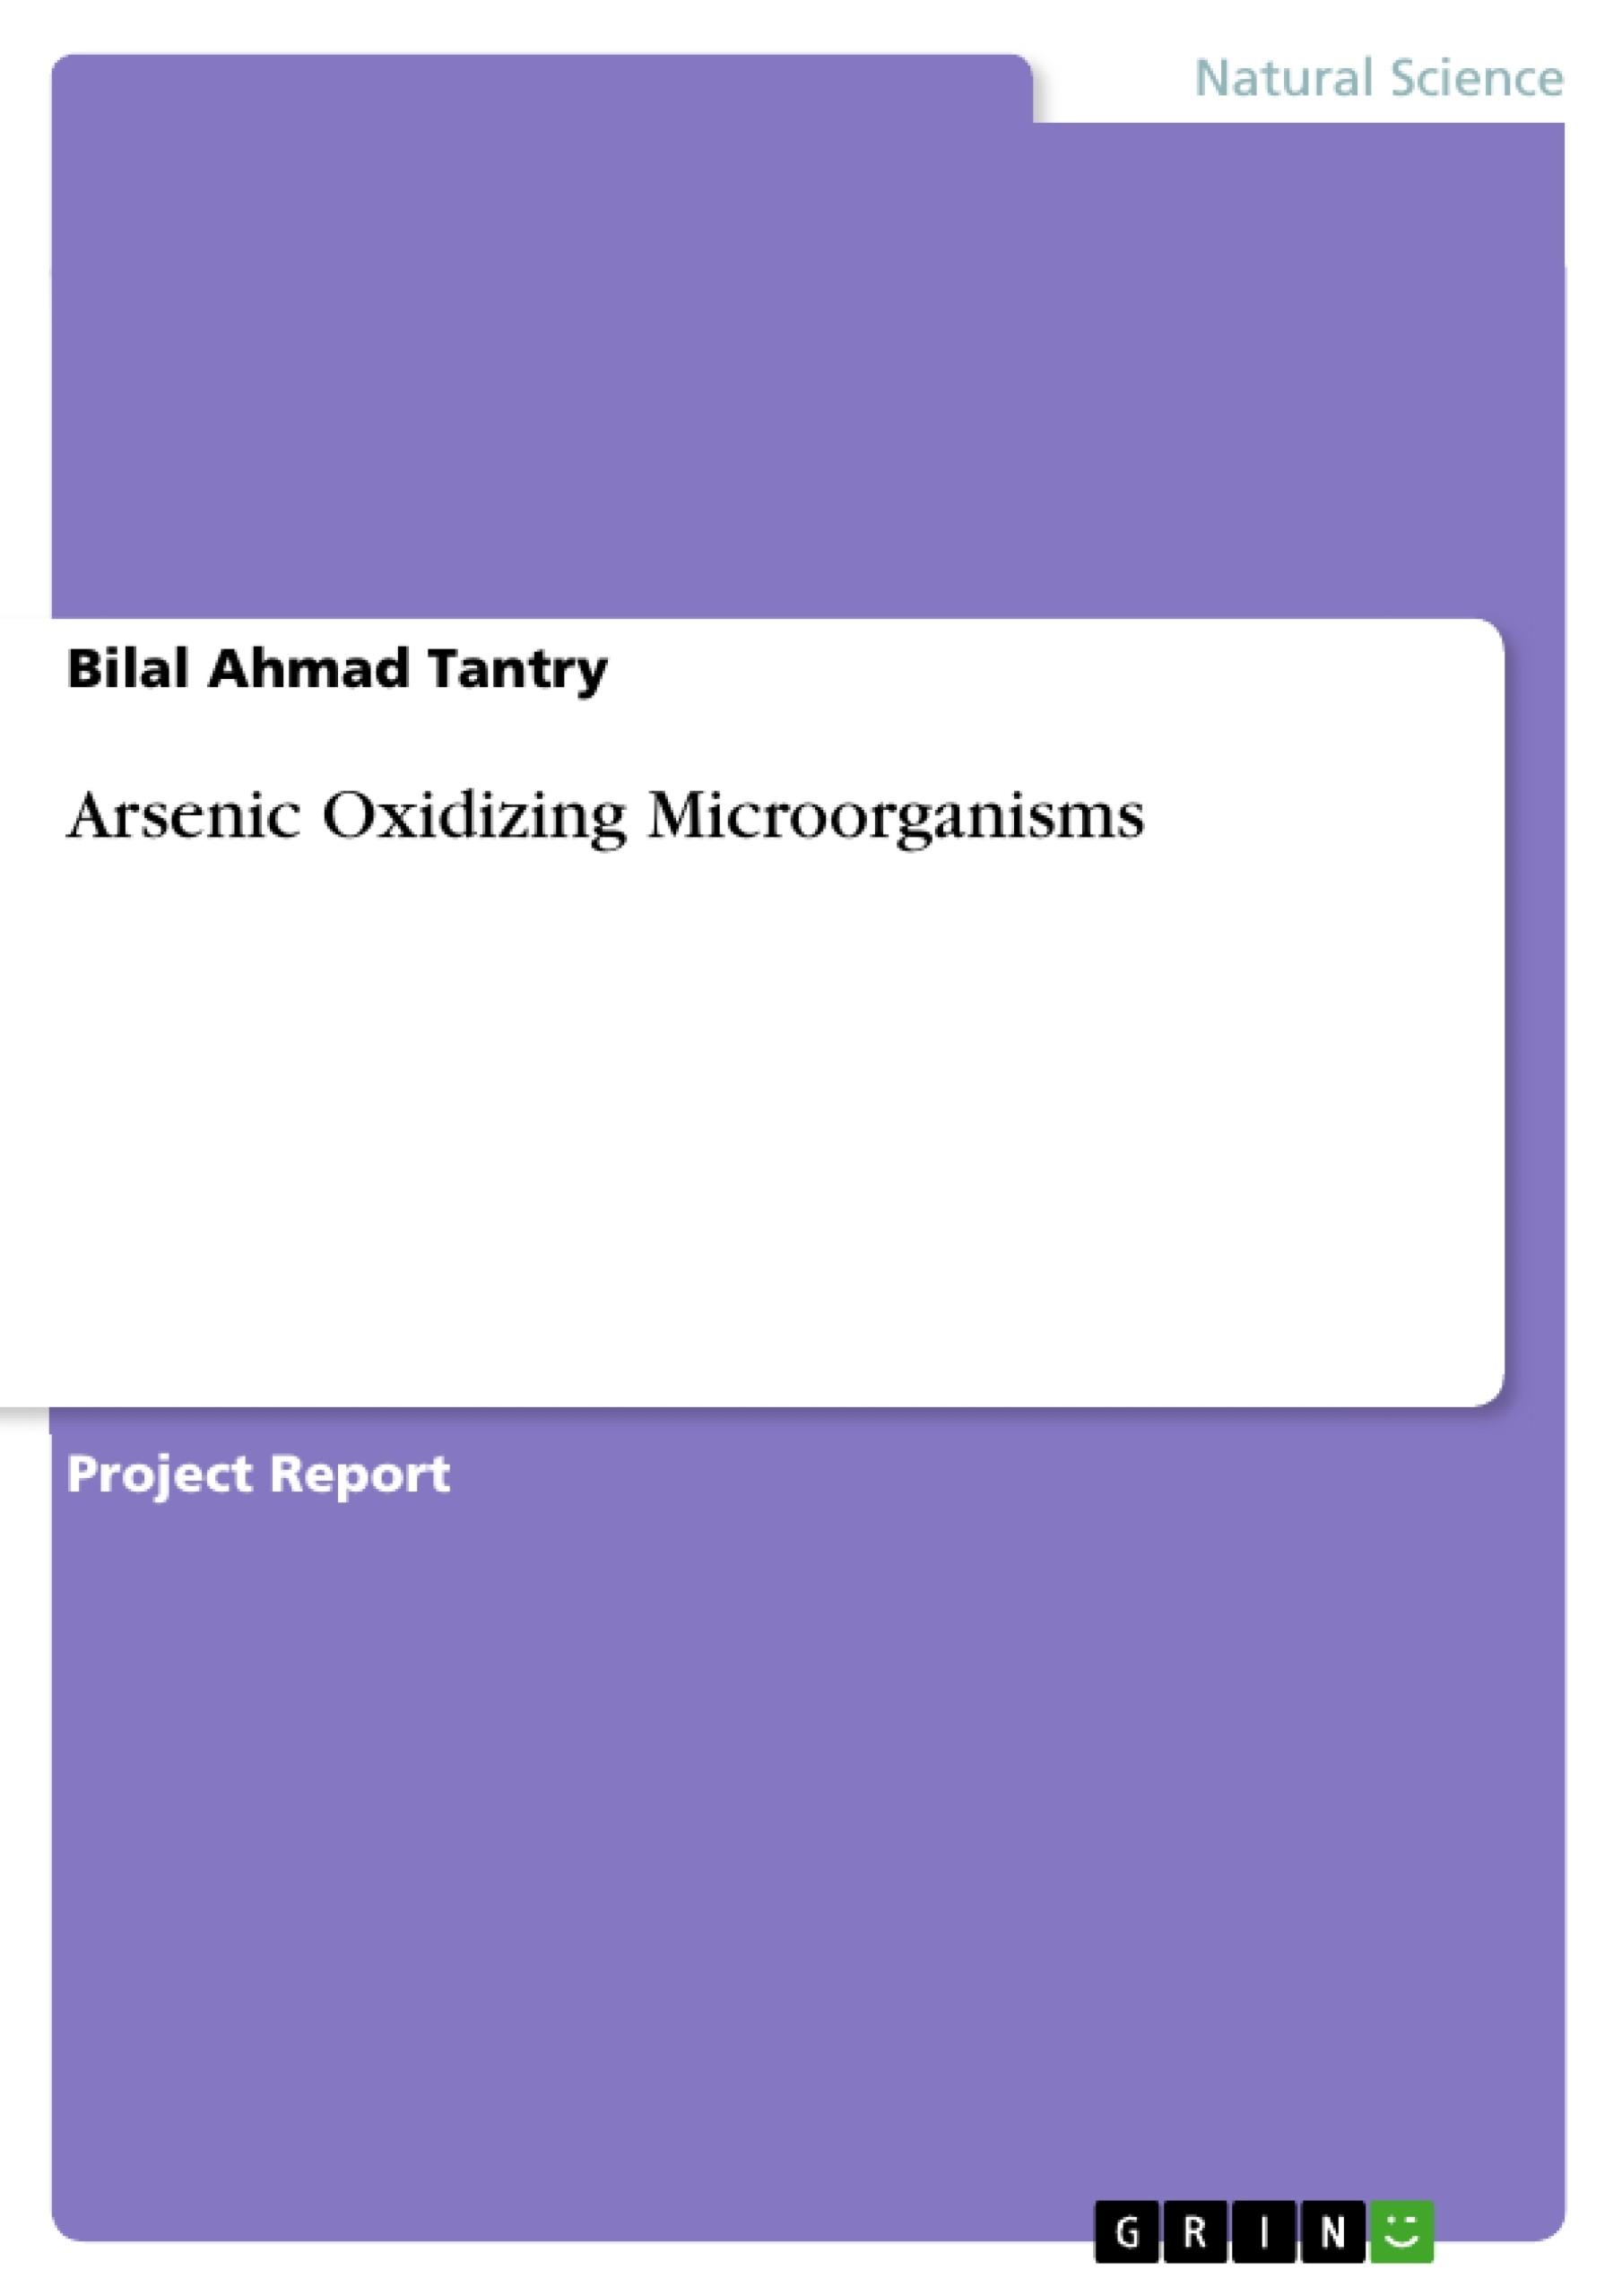 Title: Arsenic Oxidizing Microorganisms